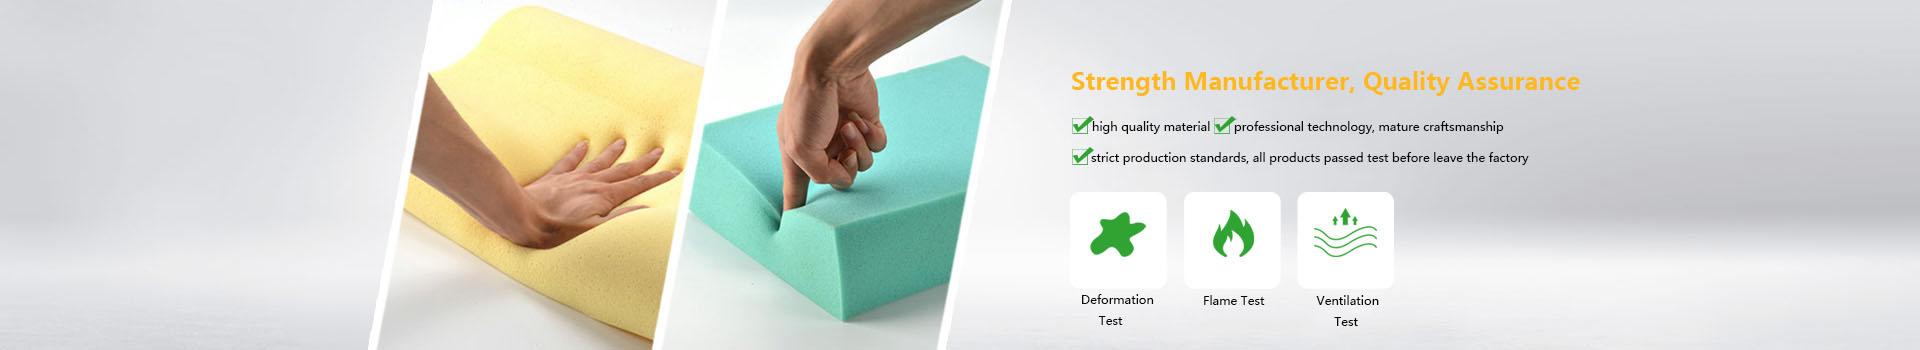 Mb Strength Manufacturer